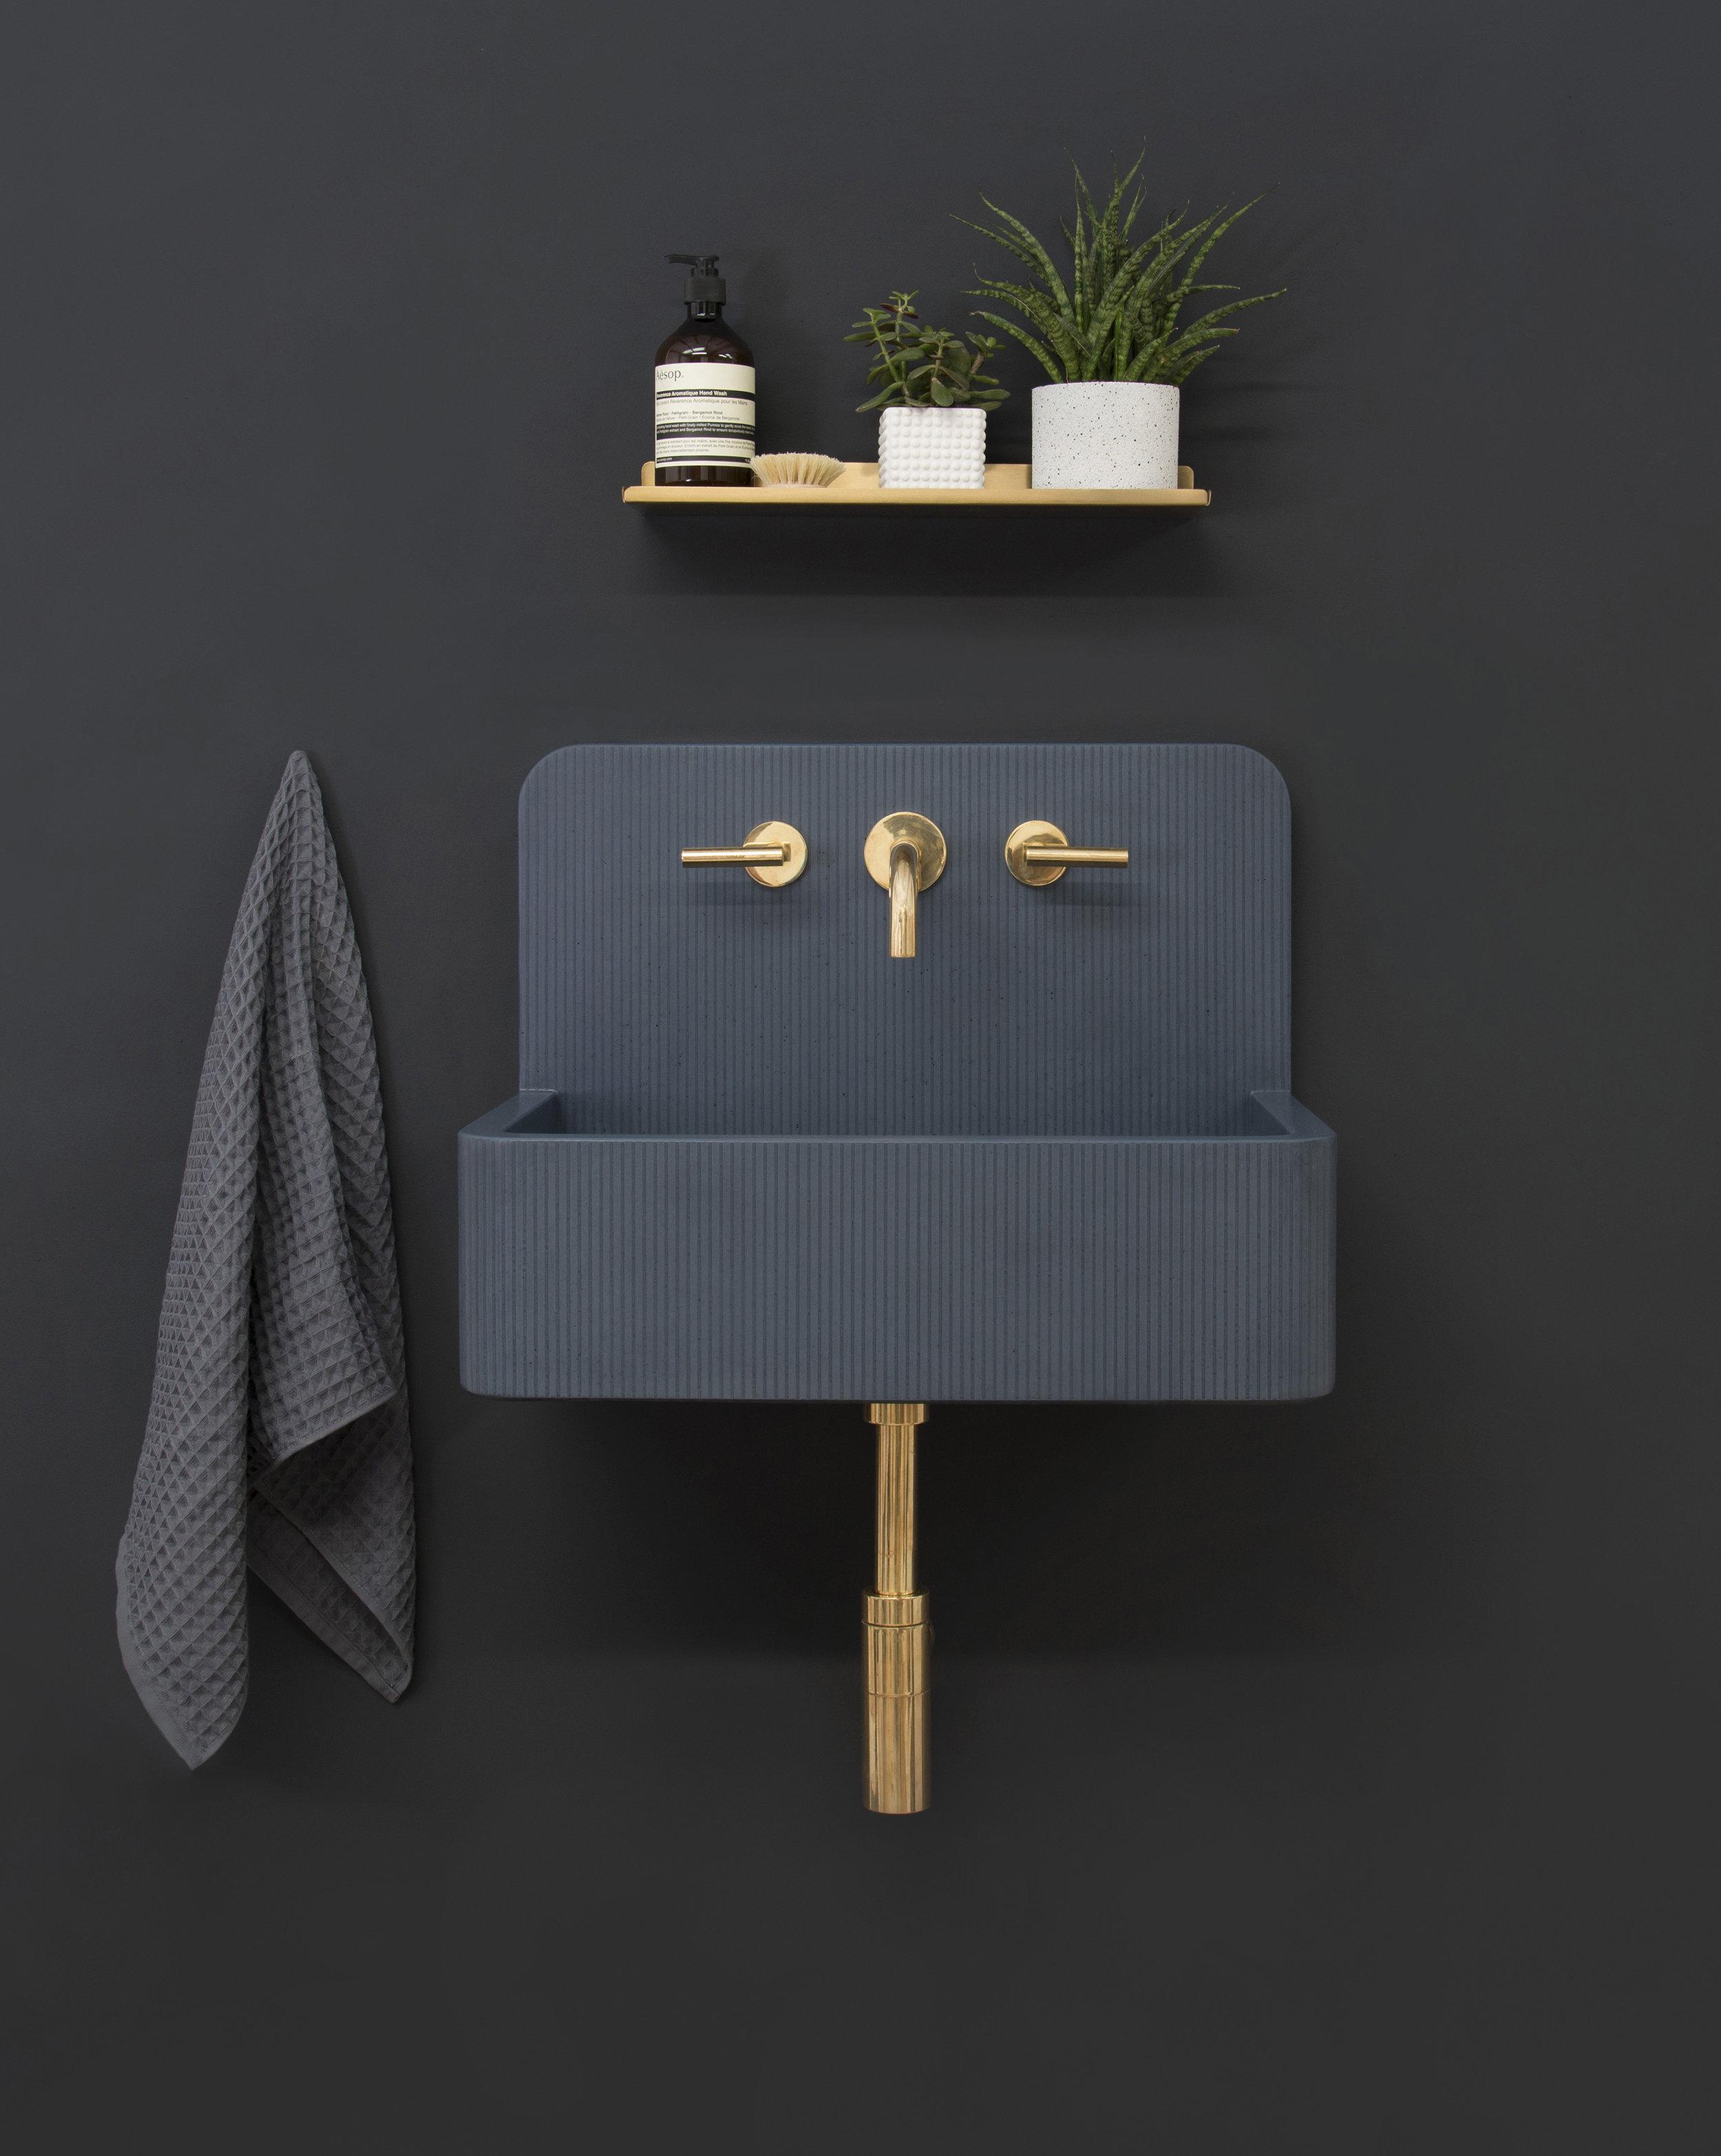 Unique Bathroom Pedestal Sinks Artcomcrea